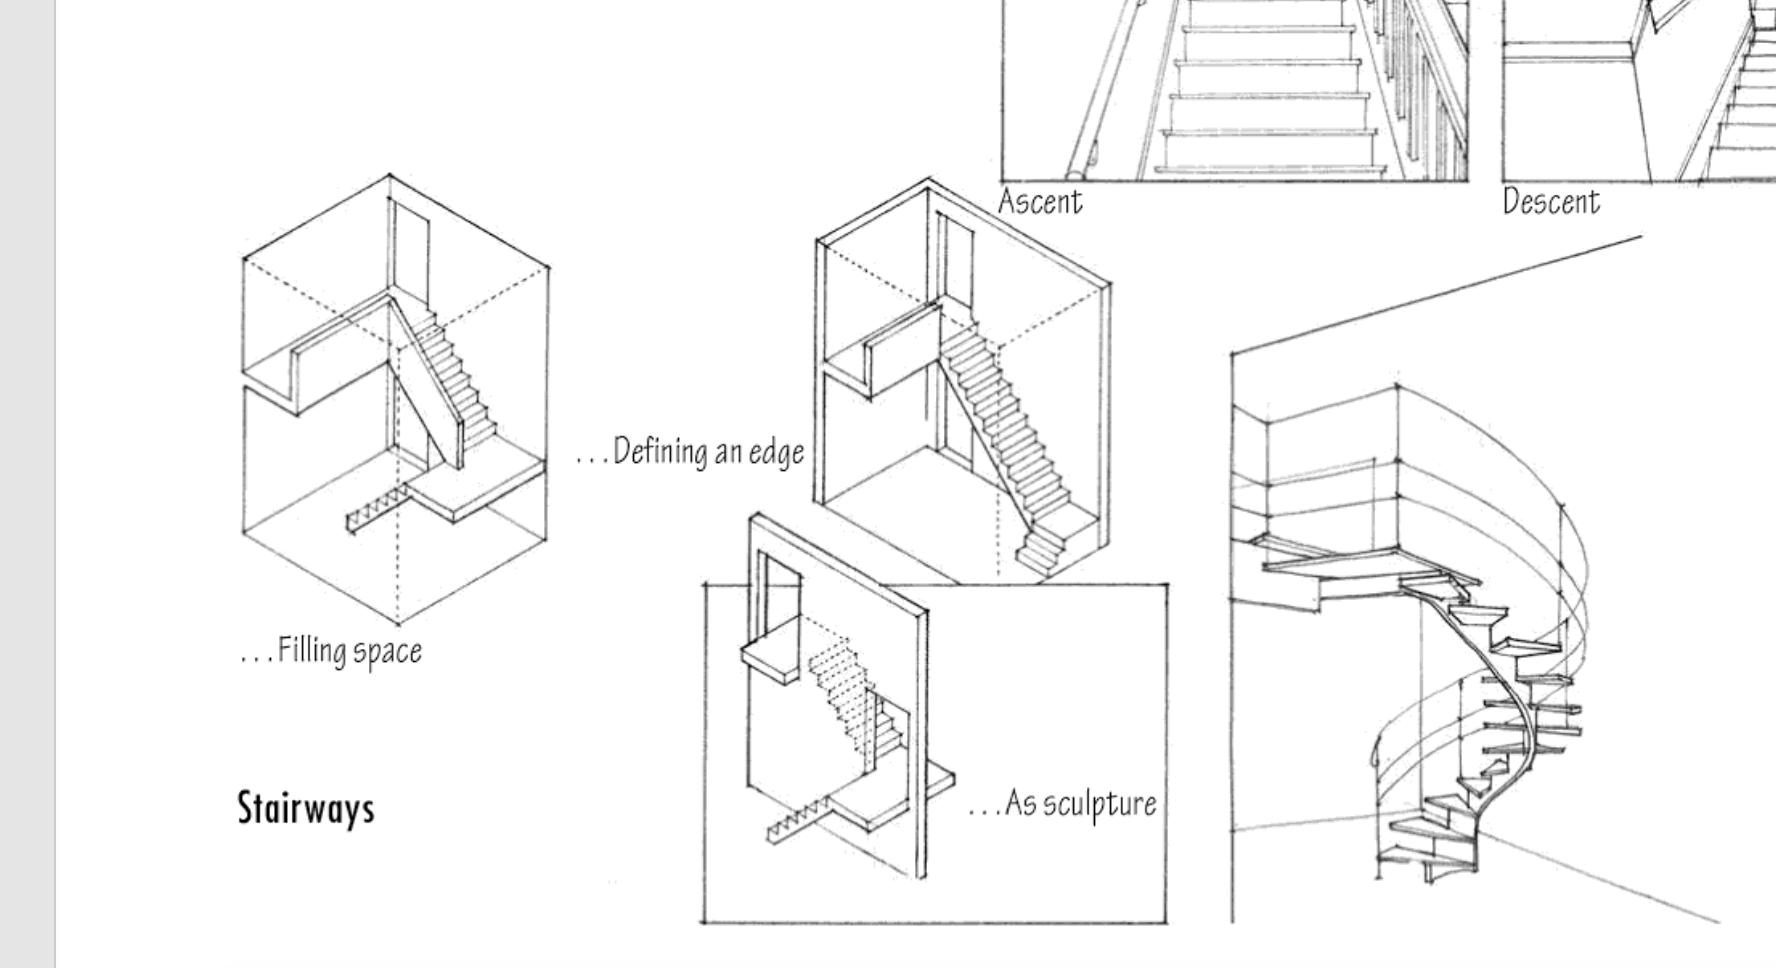 stair axon thesis stairs ladder staircases stairway ladders stairways [ 1776 x 968 Pixel ]